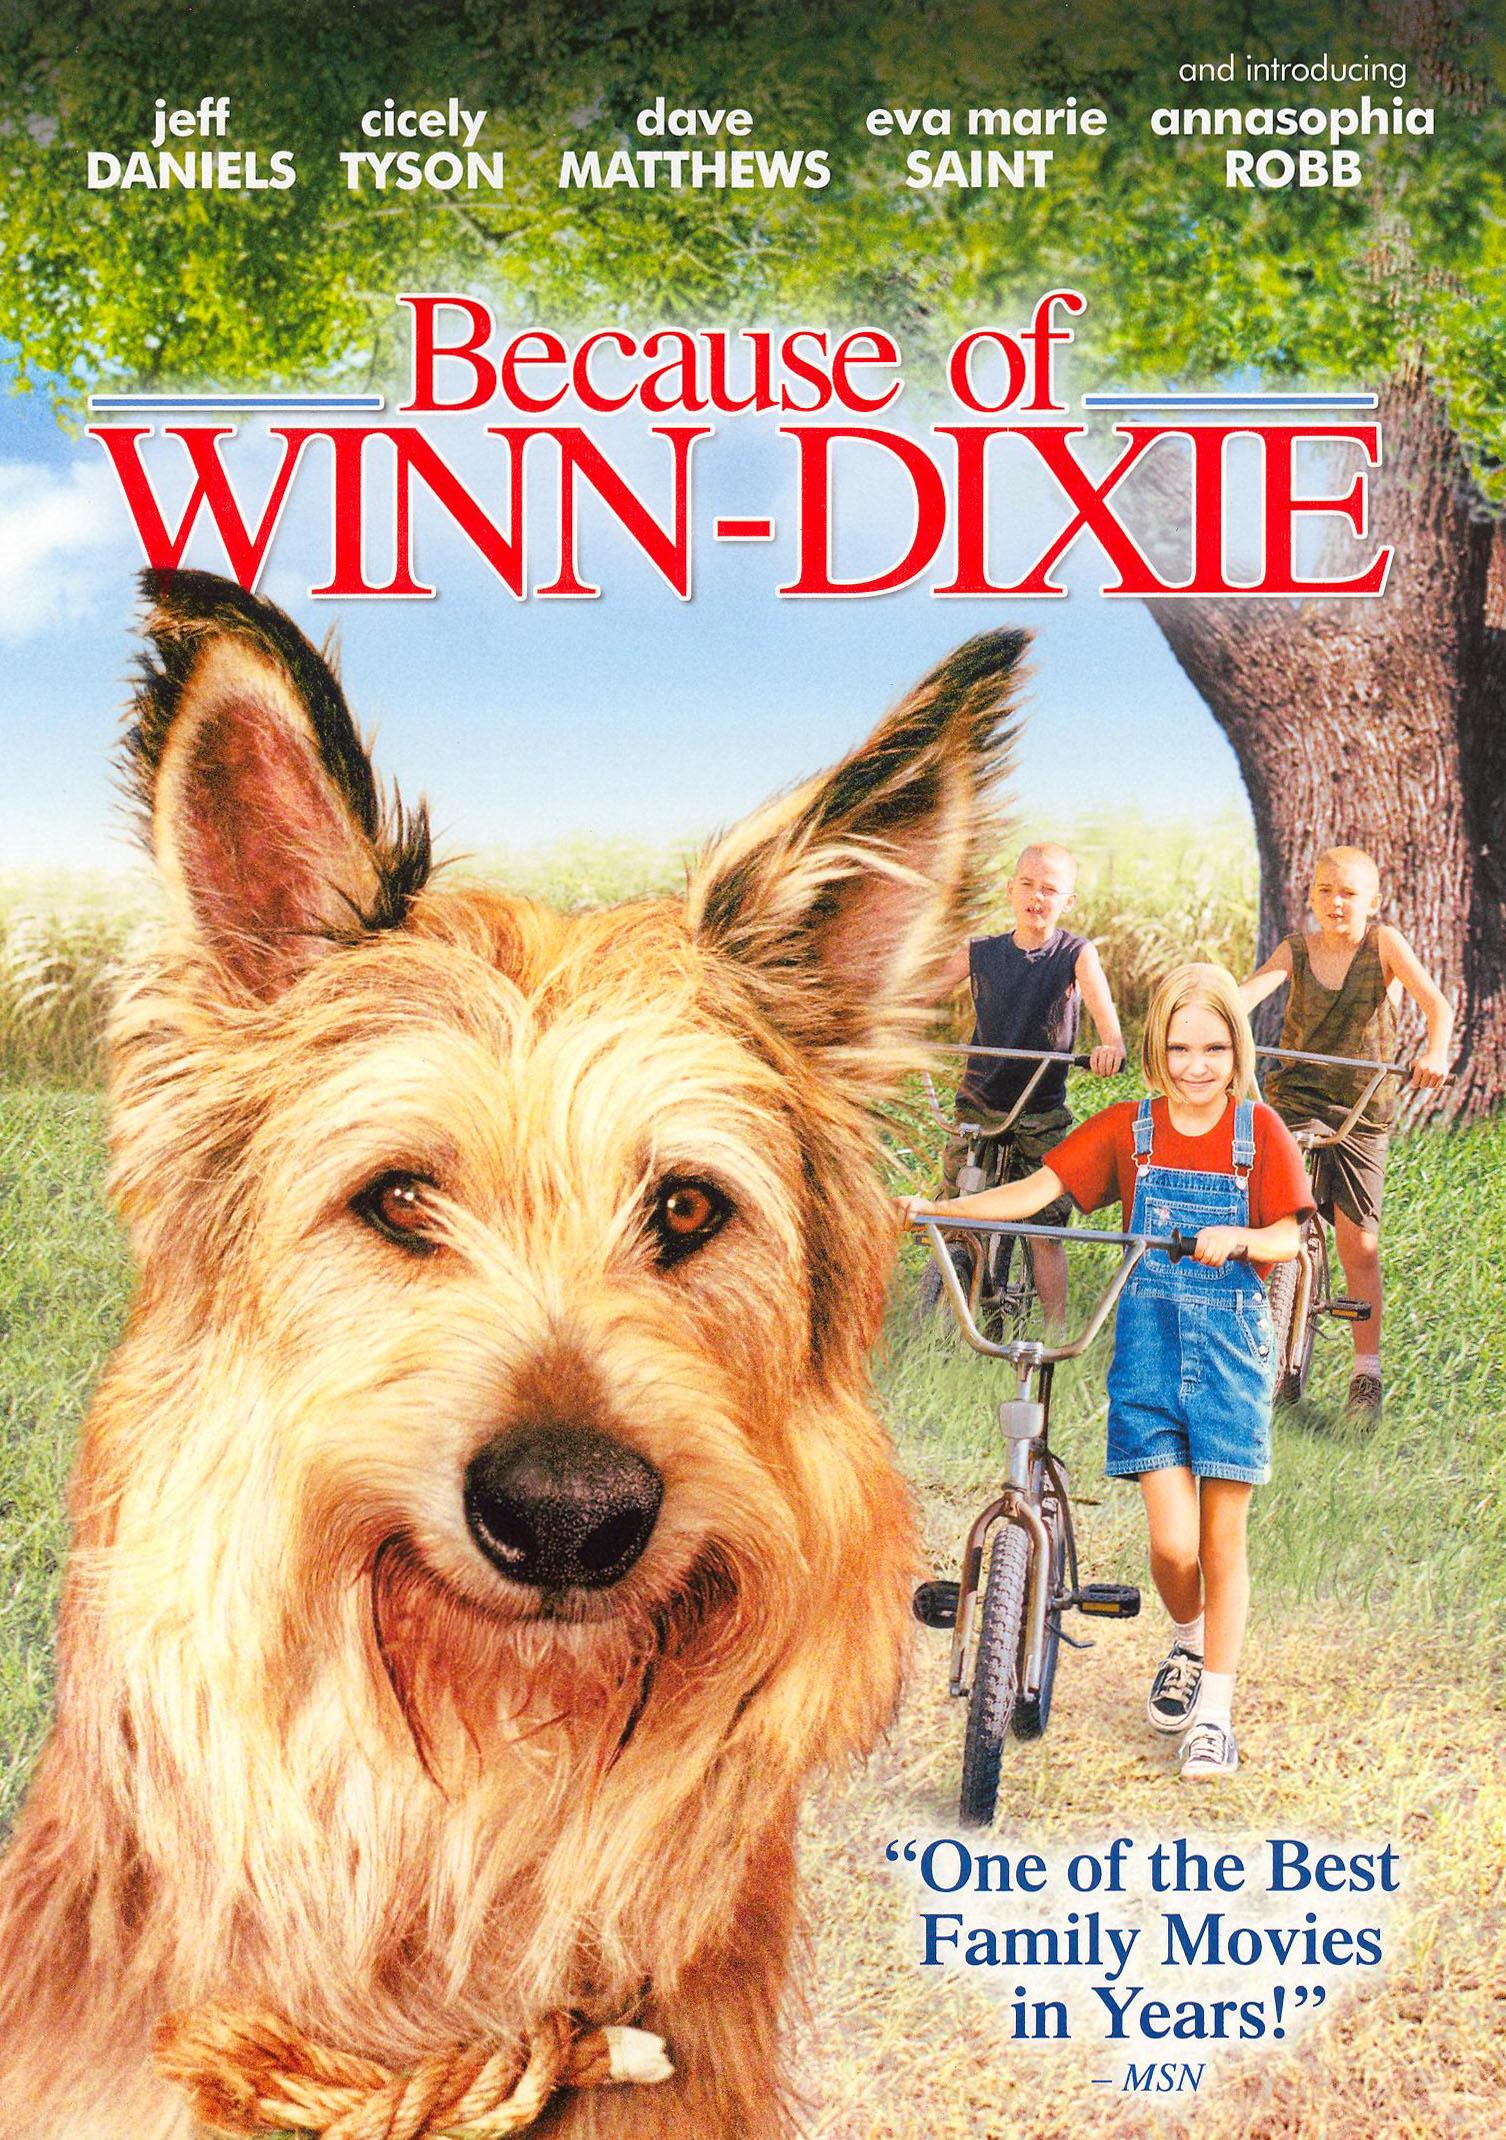 DVD Review: Because of Winn-Dixie - Slant Magazine